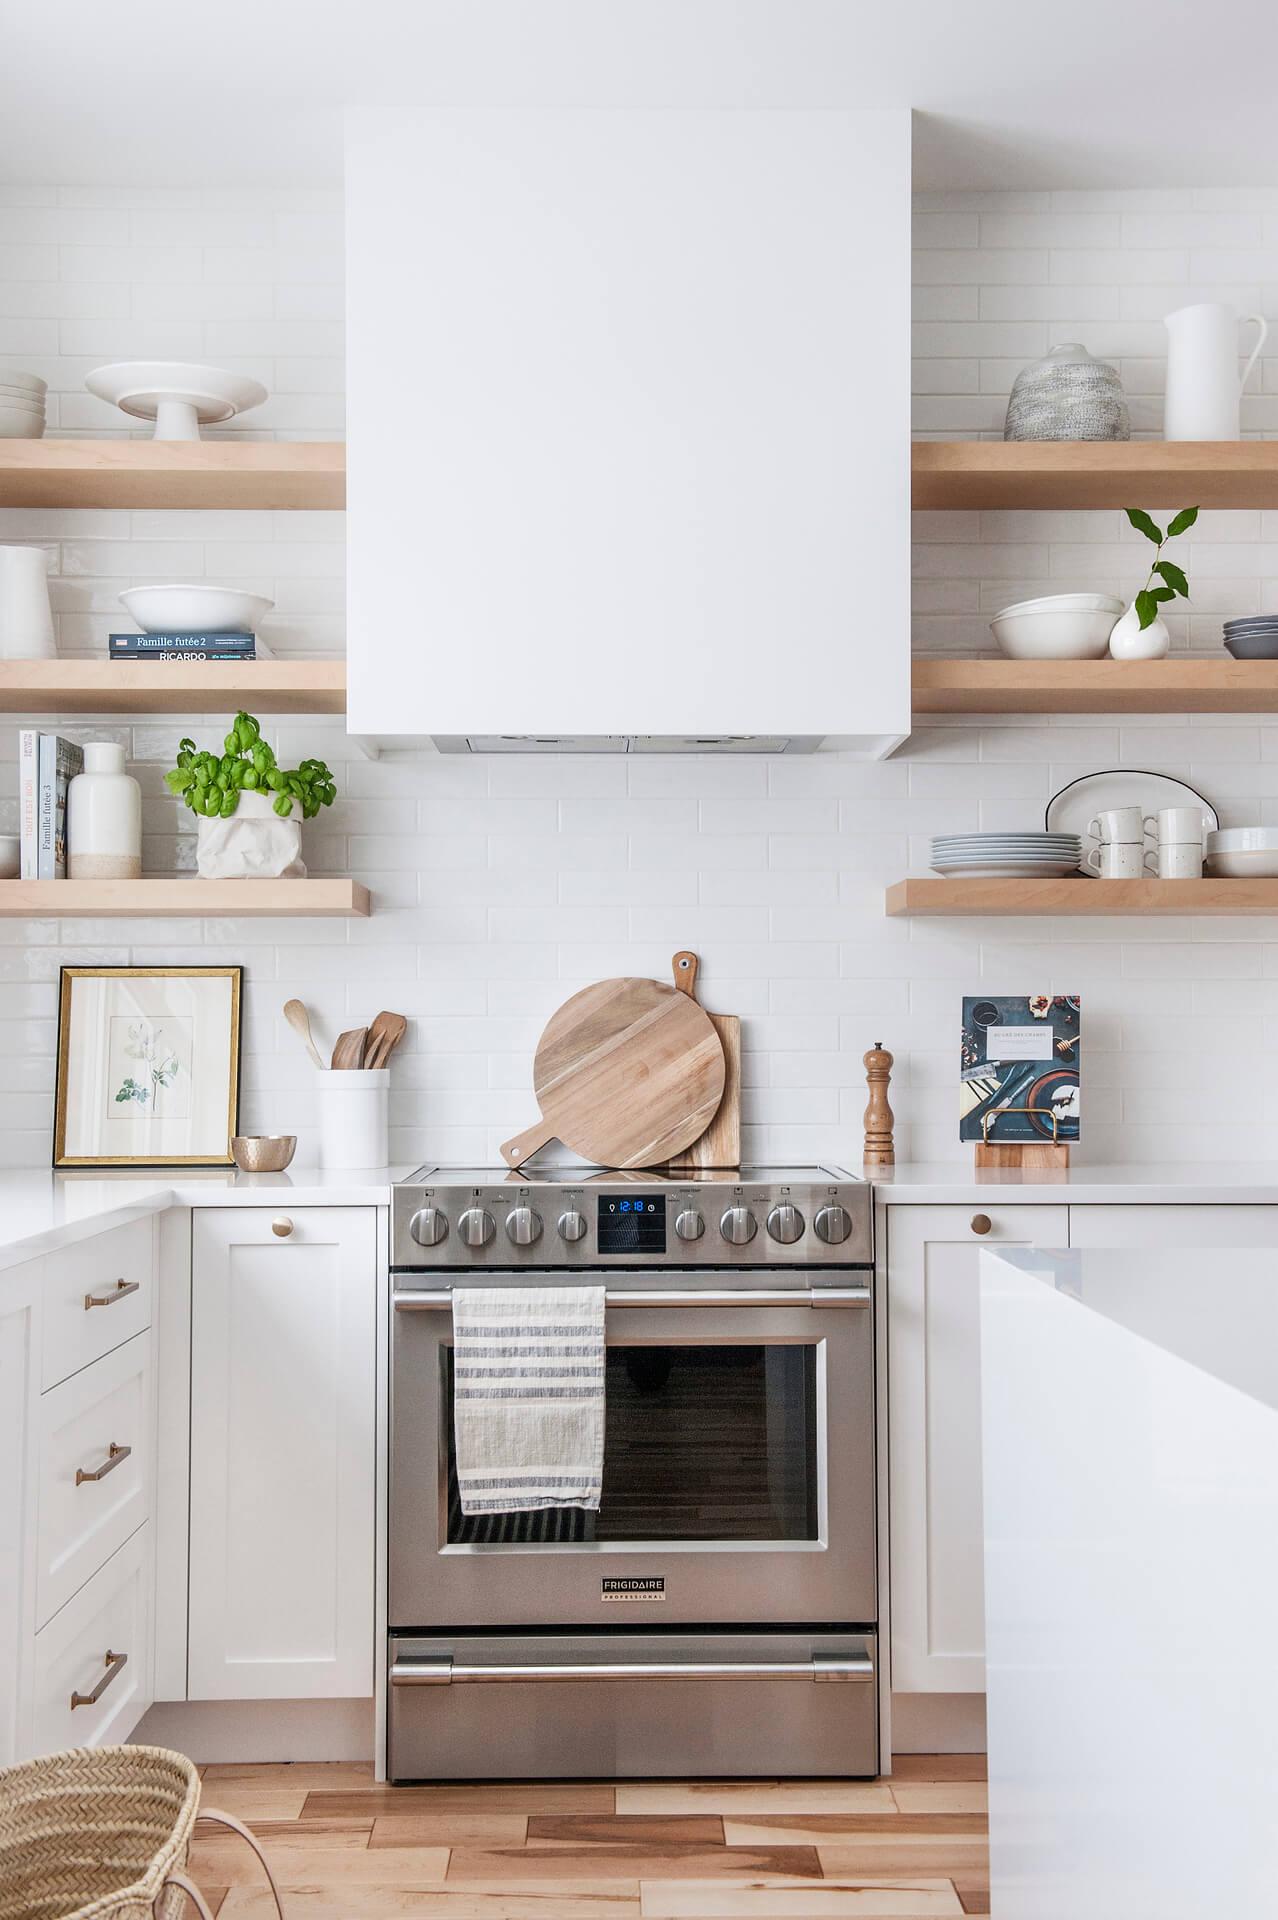 AKB Design cuisine blanche armoire noire poignee laiton comptoir quartz garde manger 17